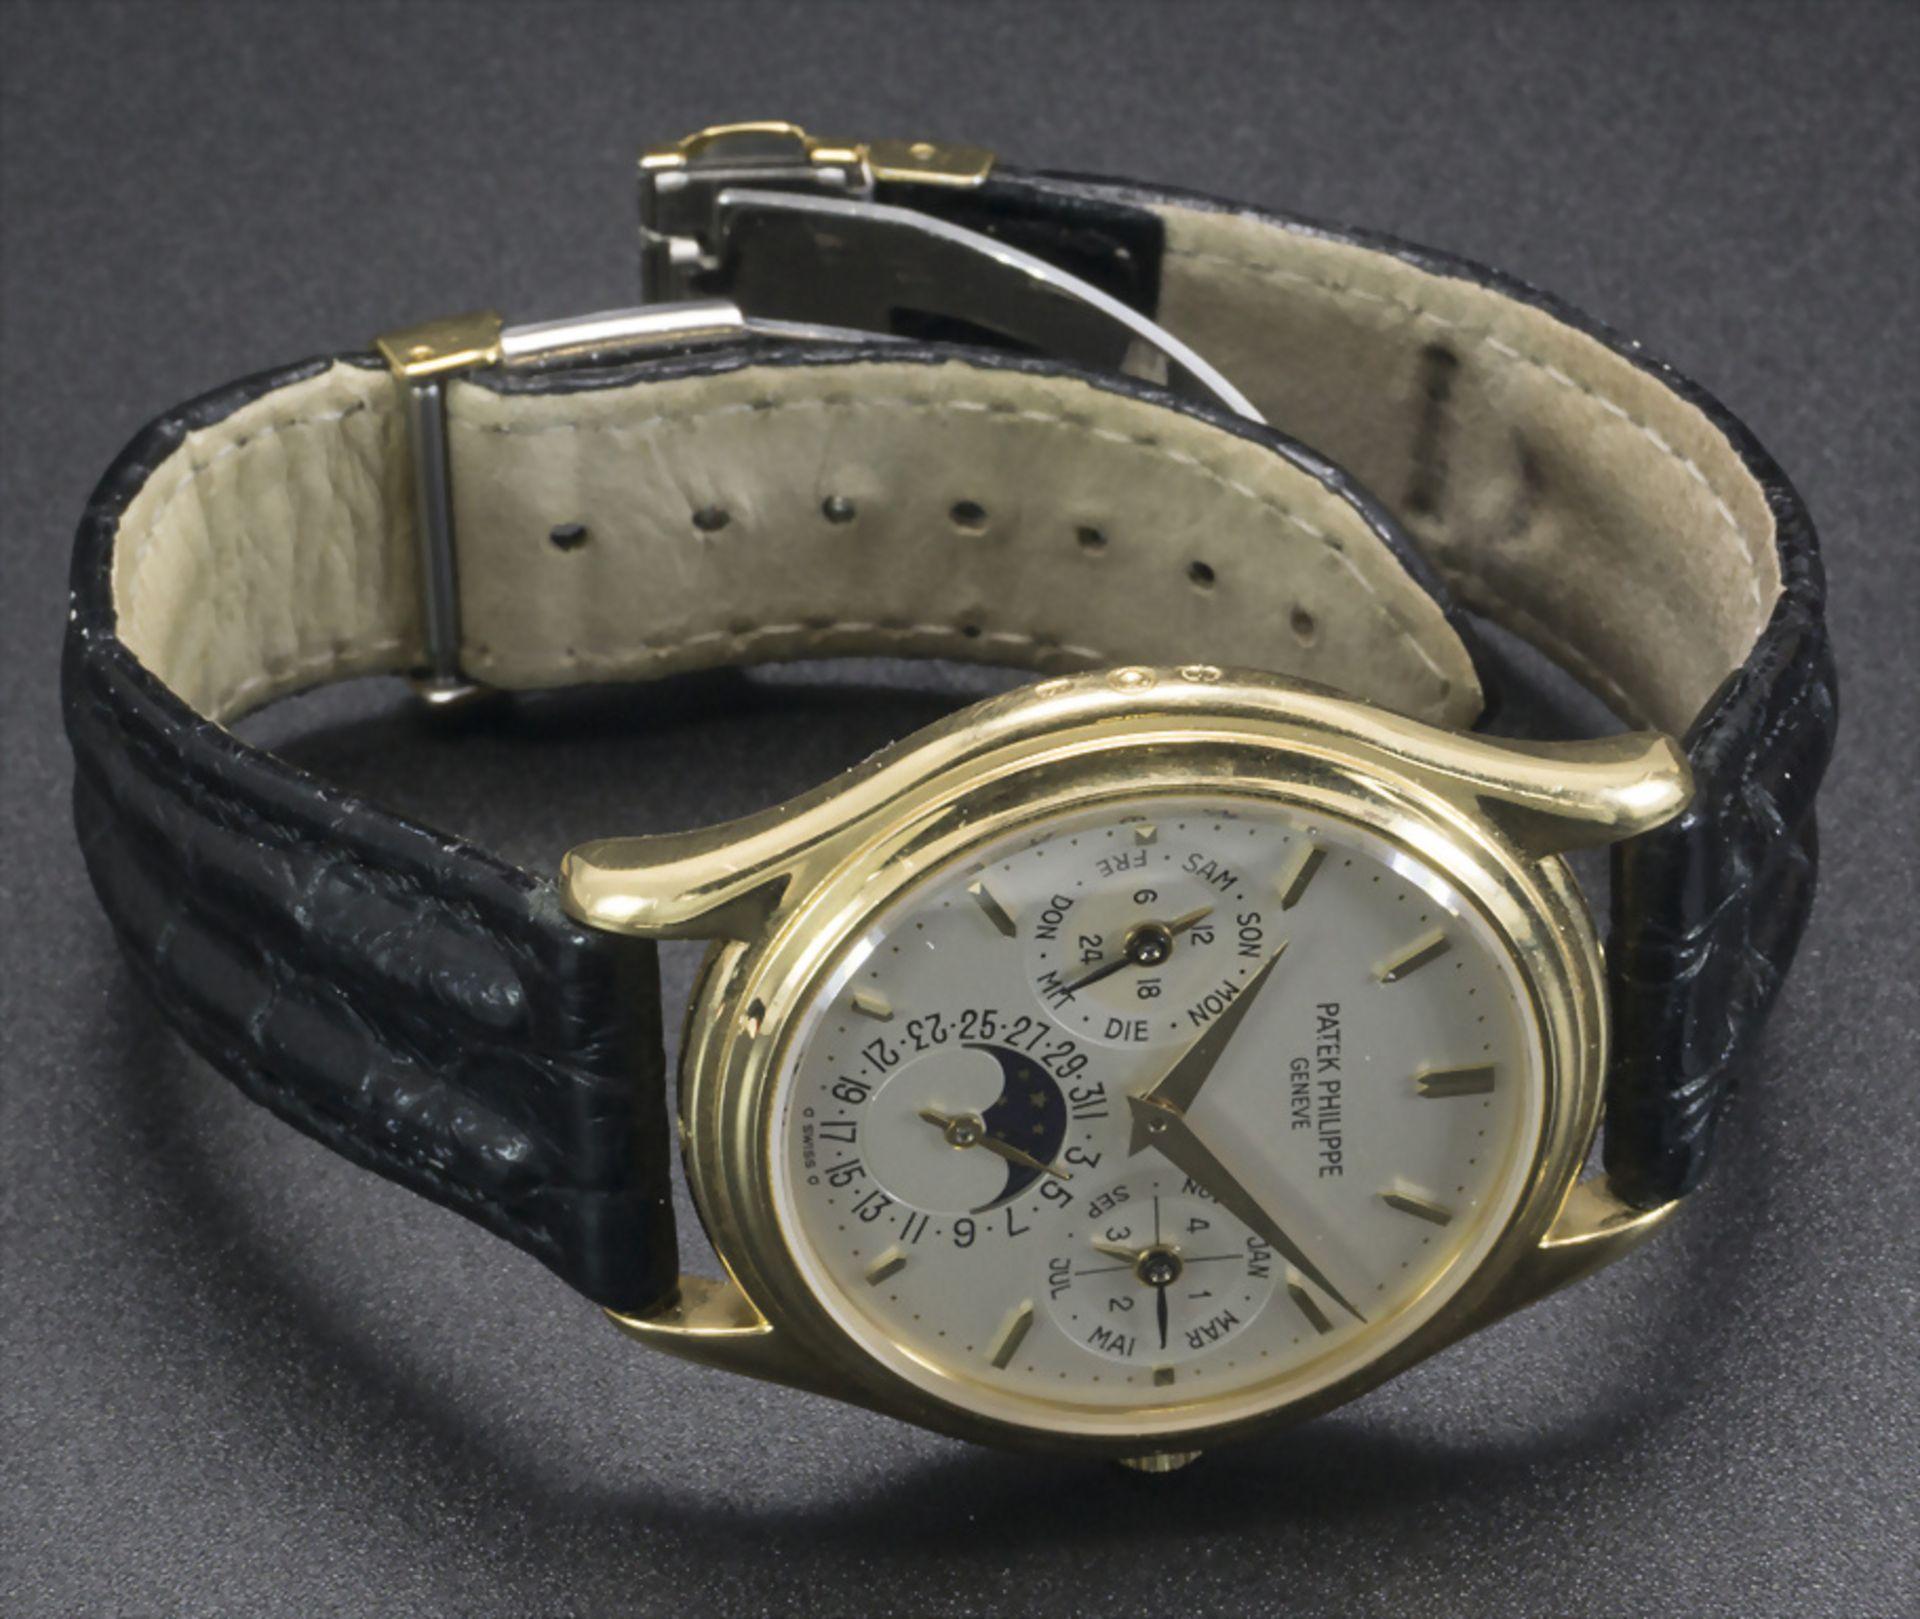 Armbanduhr, Automatik mit ewigem Kalender / A men's automatic wristwatch with perpetual ... - Image 6 of 7